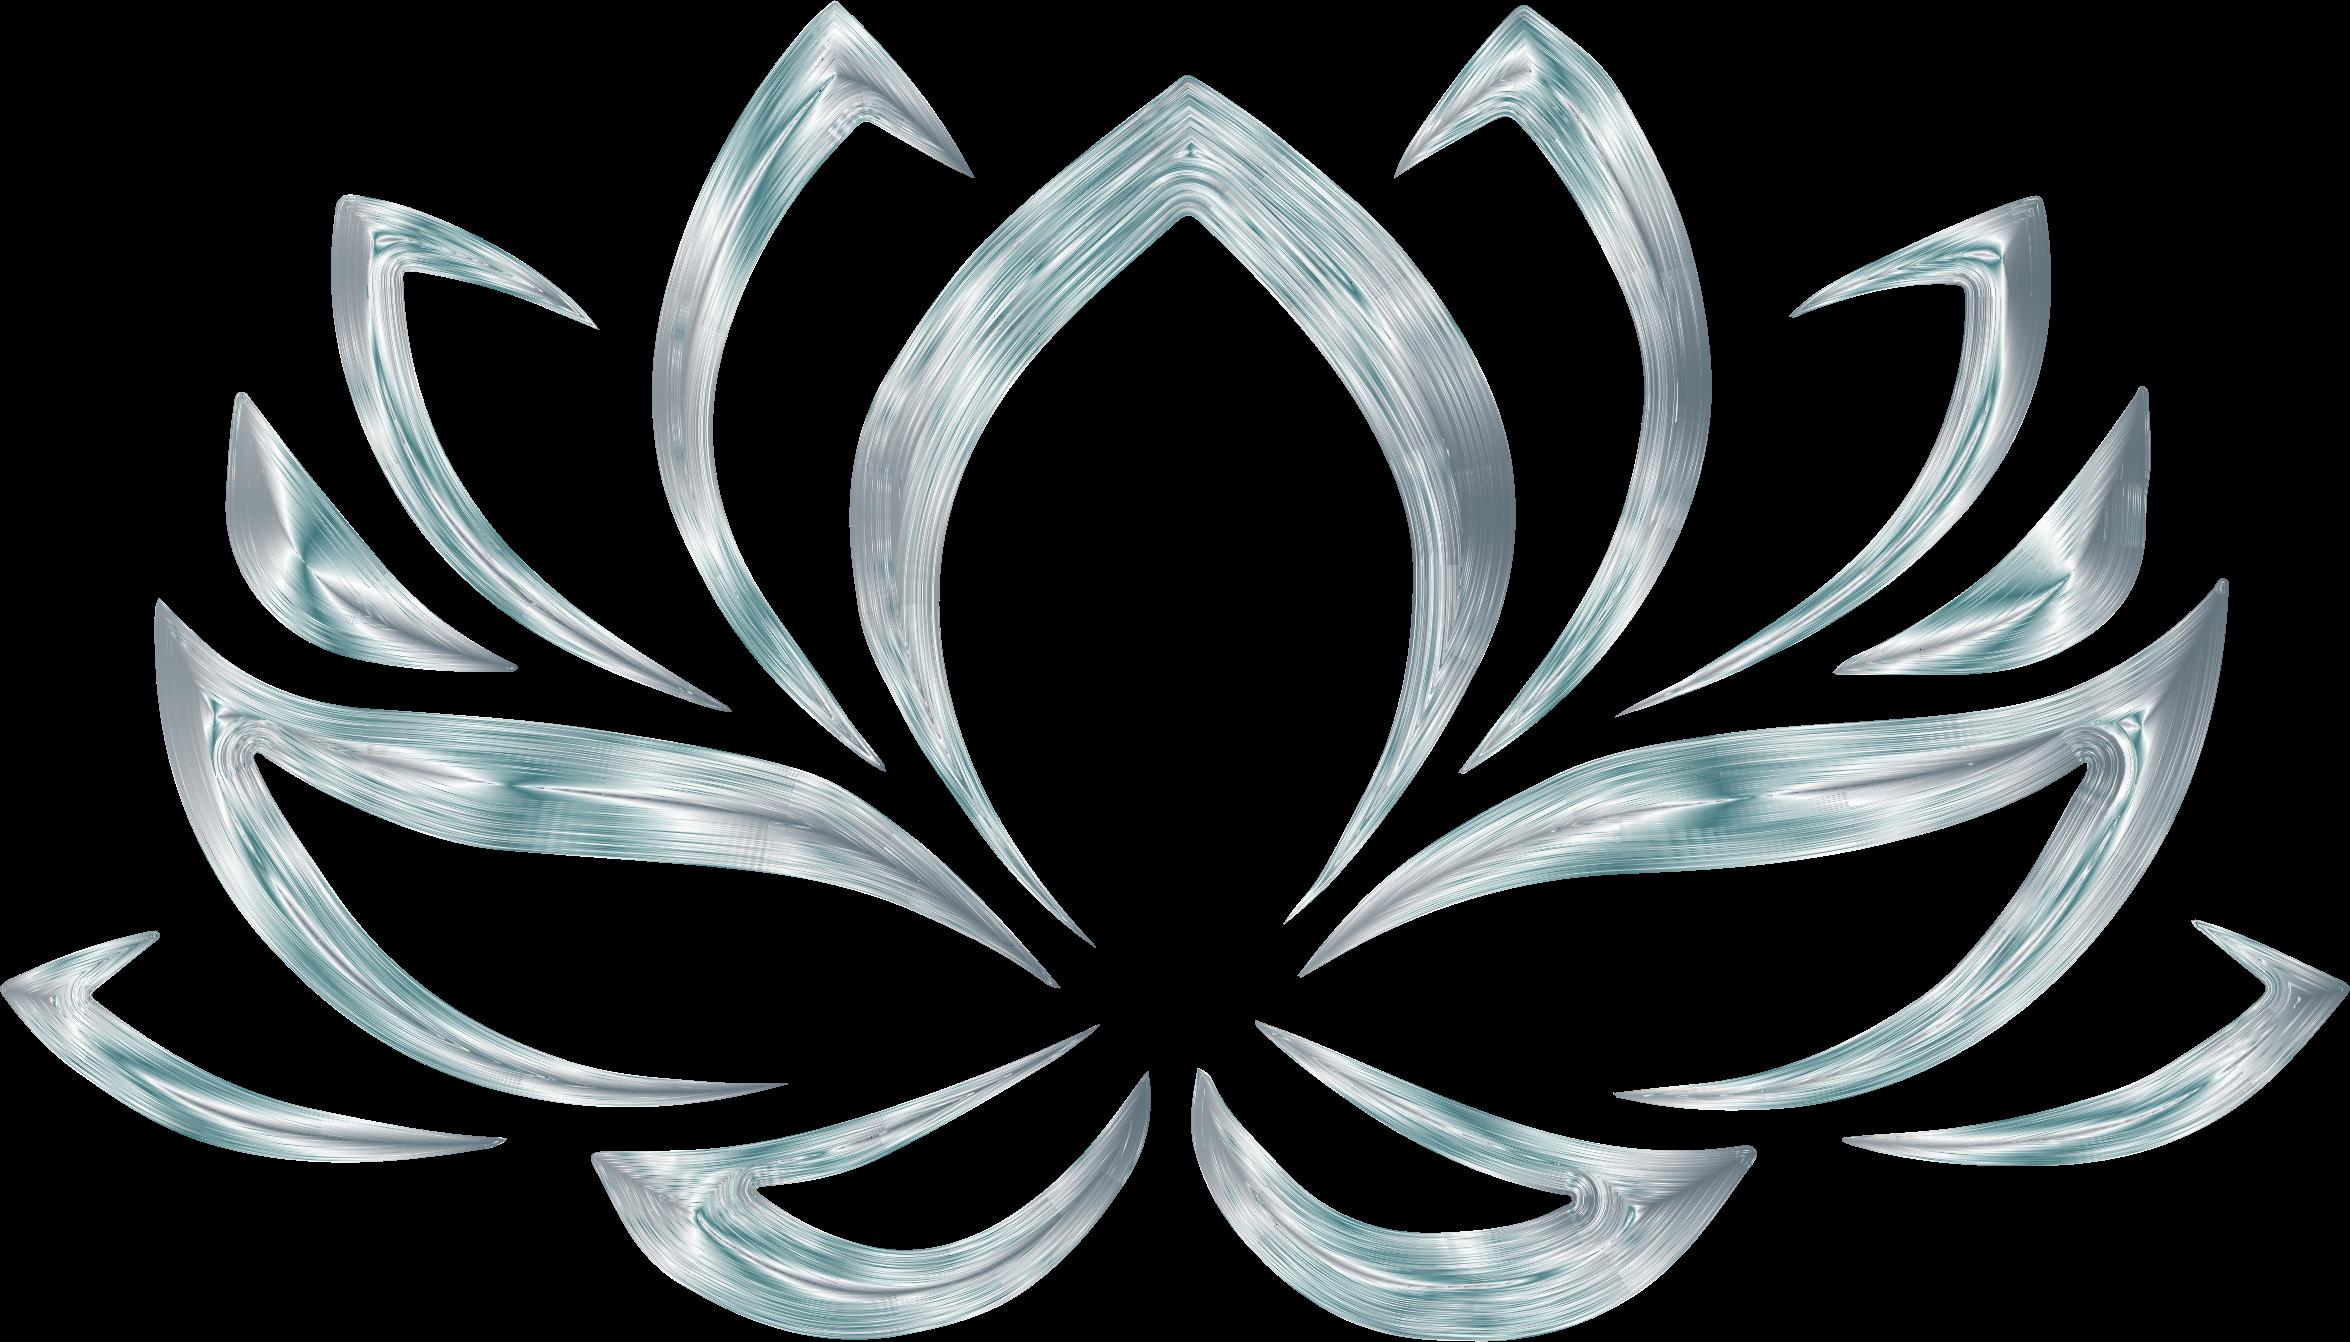 Silverized flower no background. Lotus clipart olu